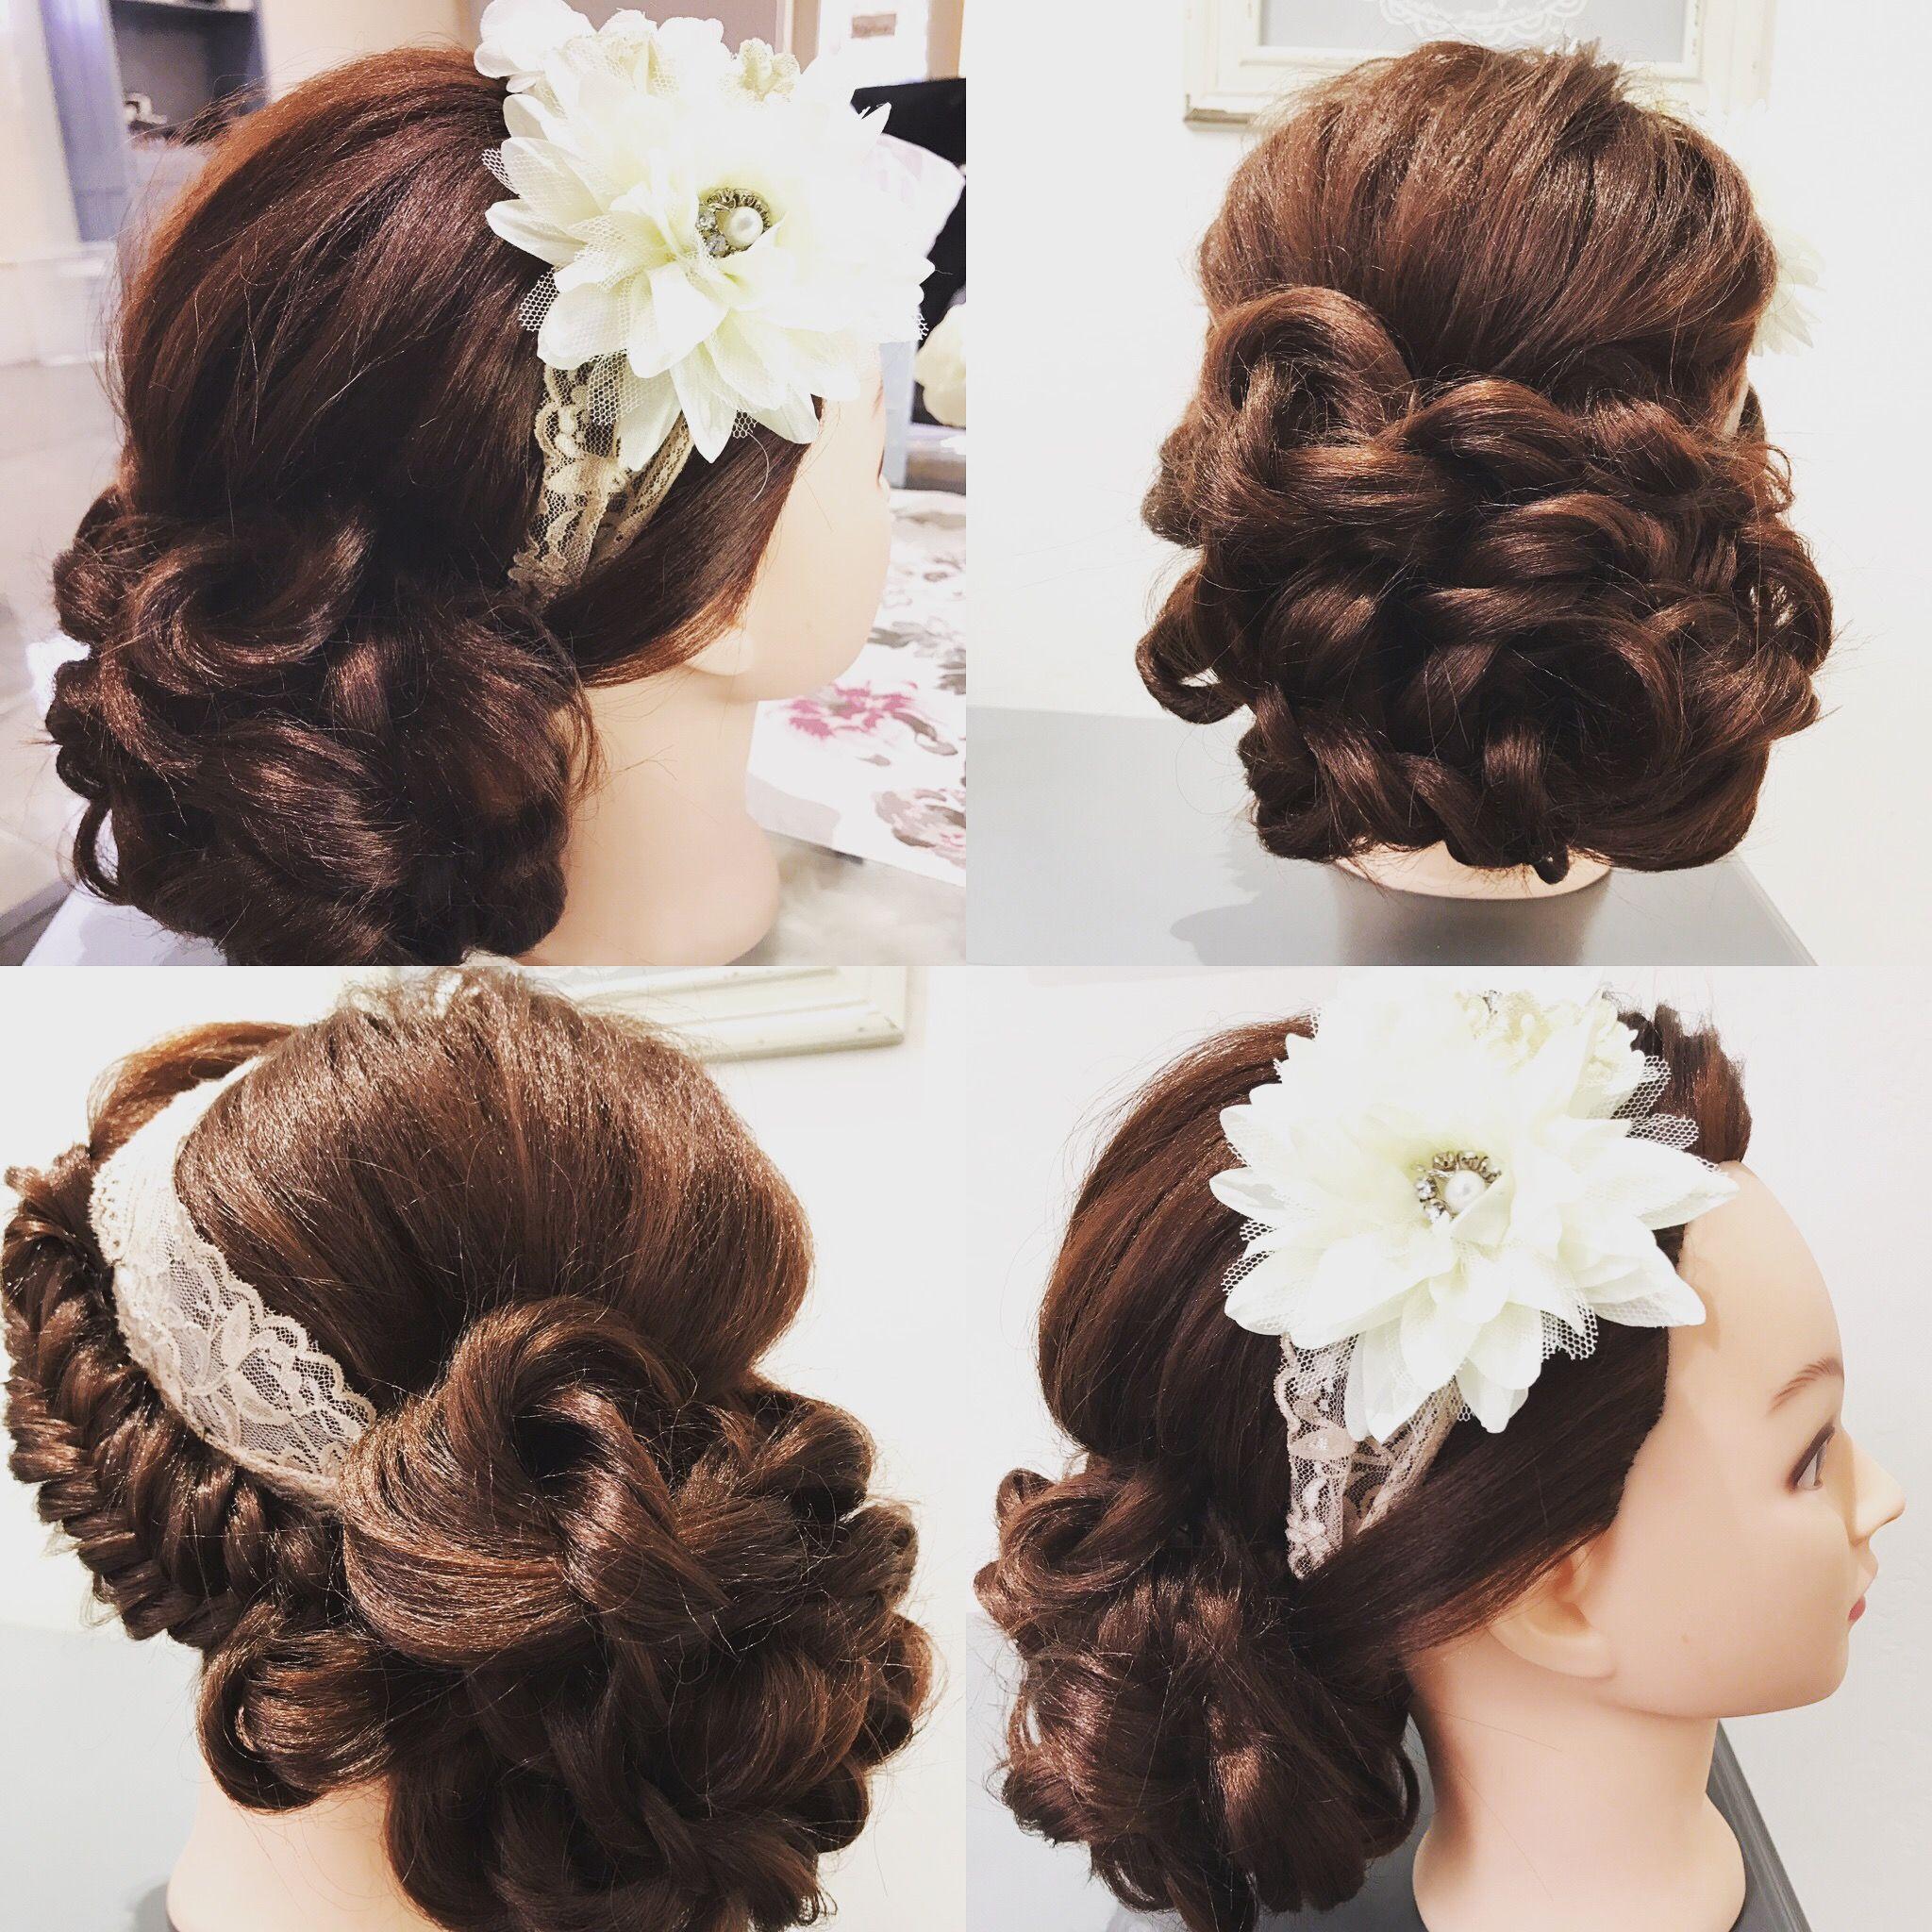 Bridal Updo Powder Room Hair And Wedding Boutique Albuquerque Nm